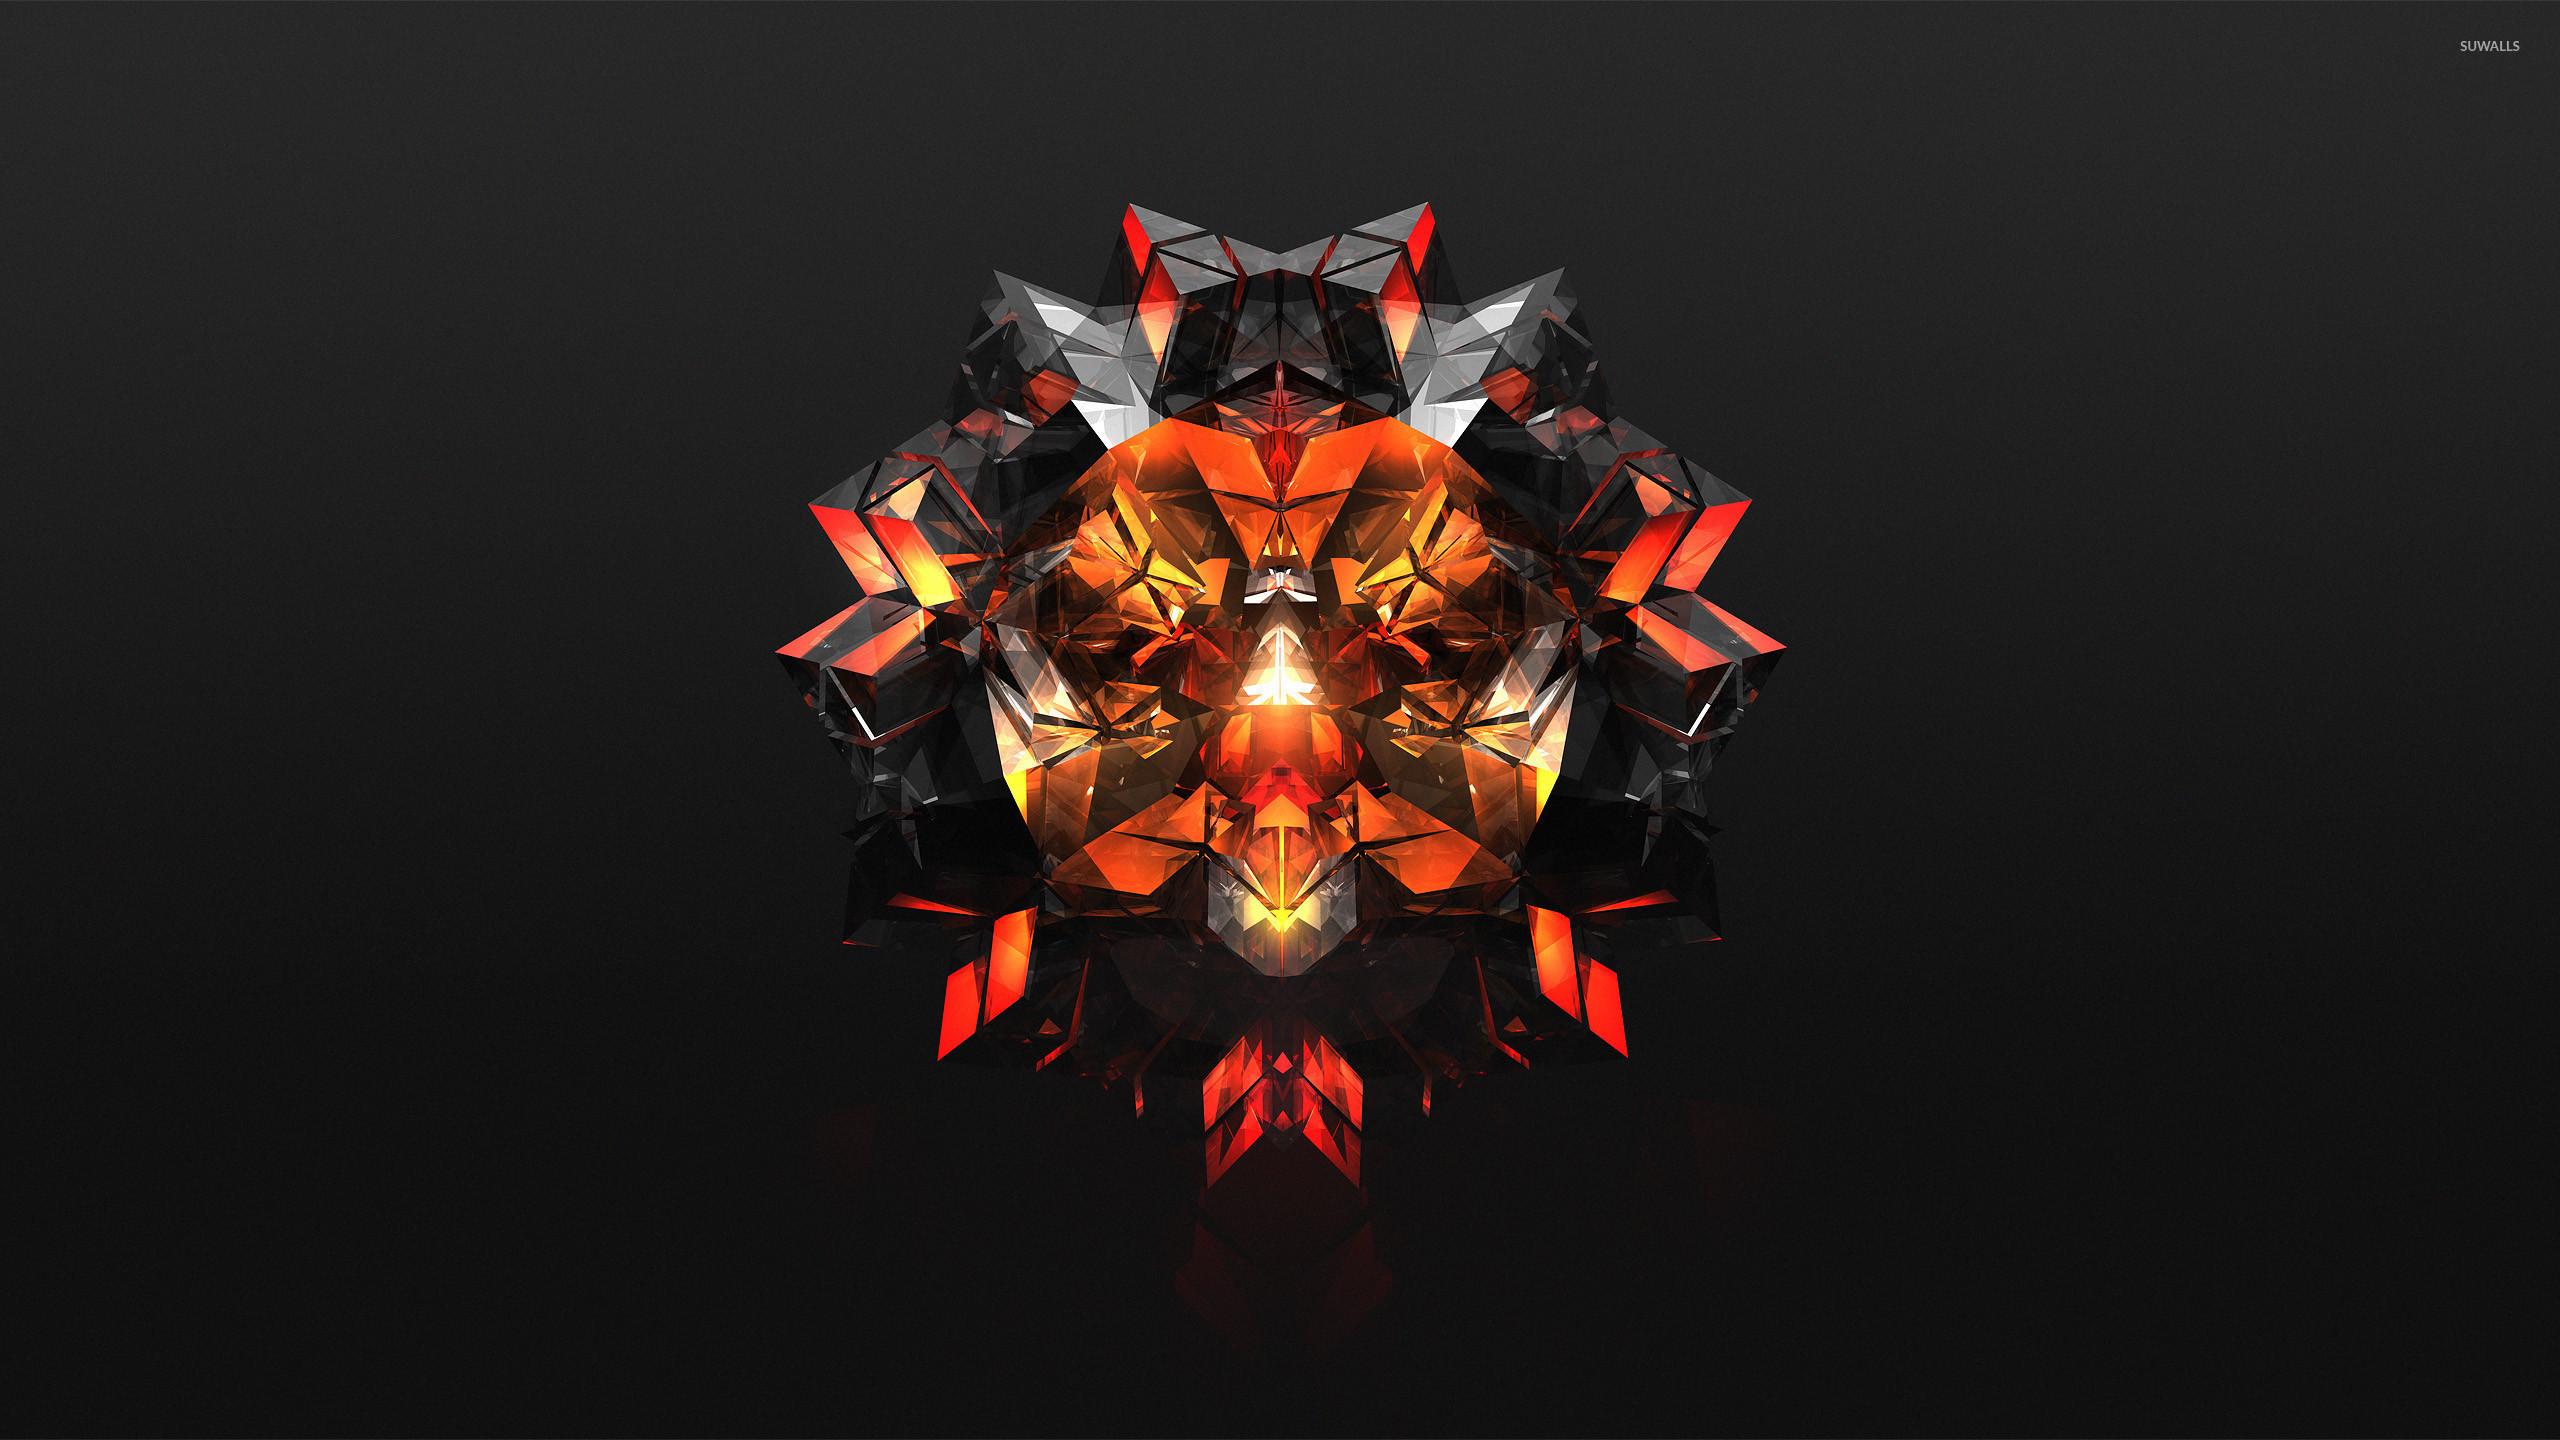 Res: 2560x1440, Black and orange diamond wallpaper